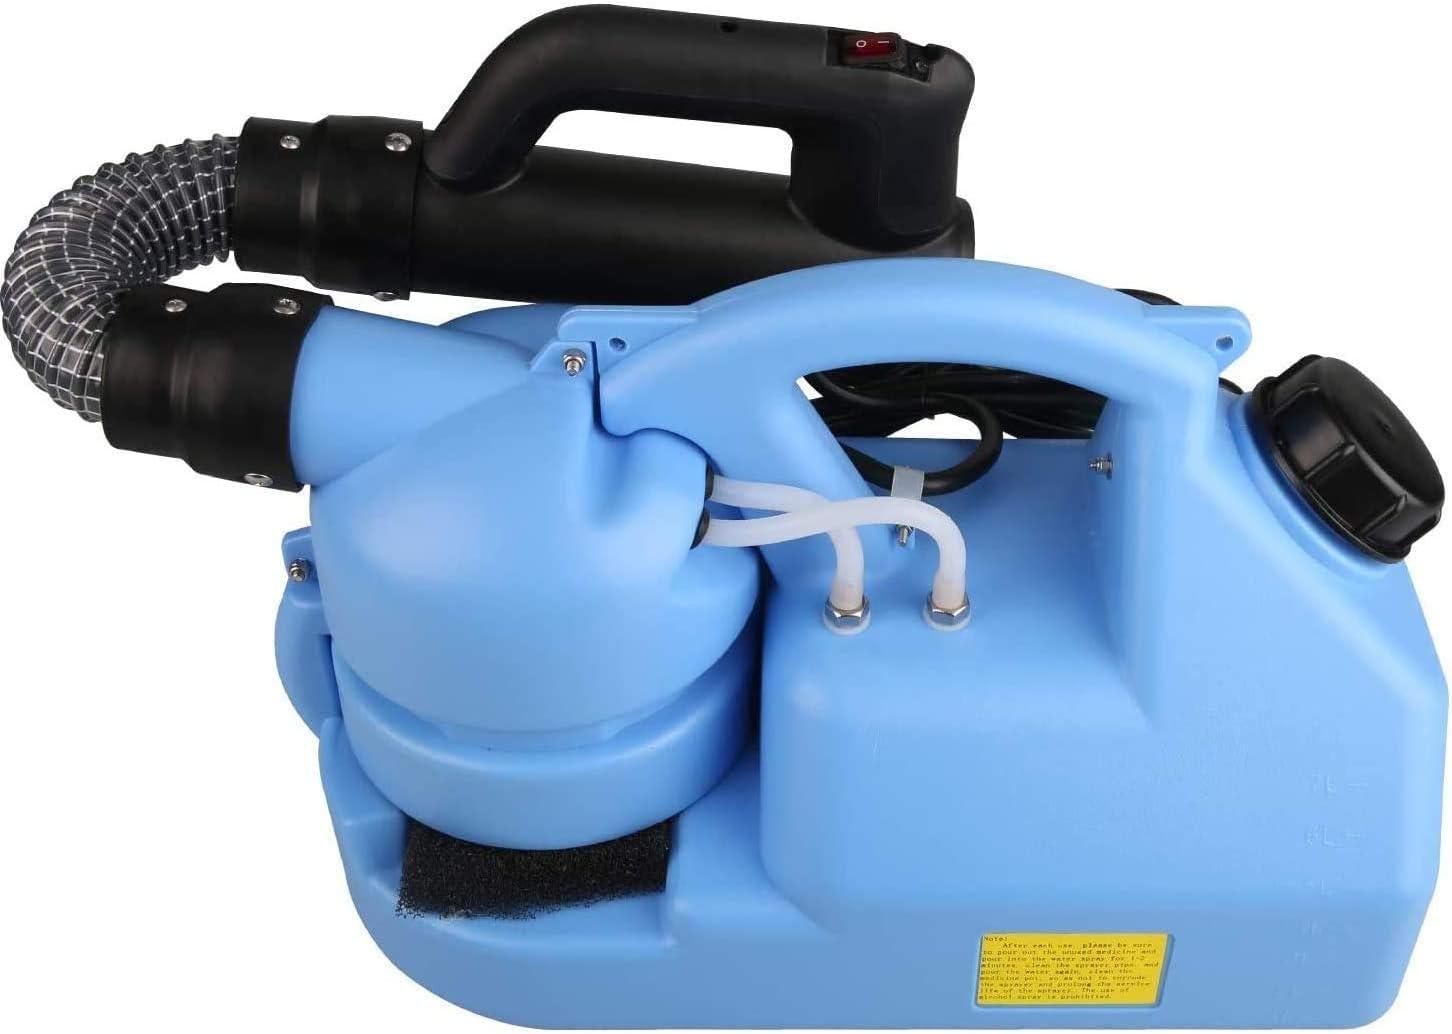 GAKUS Electric ULV Sprayer Portable Fogger Machine Disinfection Machine for Garden Home Ultra Capacity Spray Machine